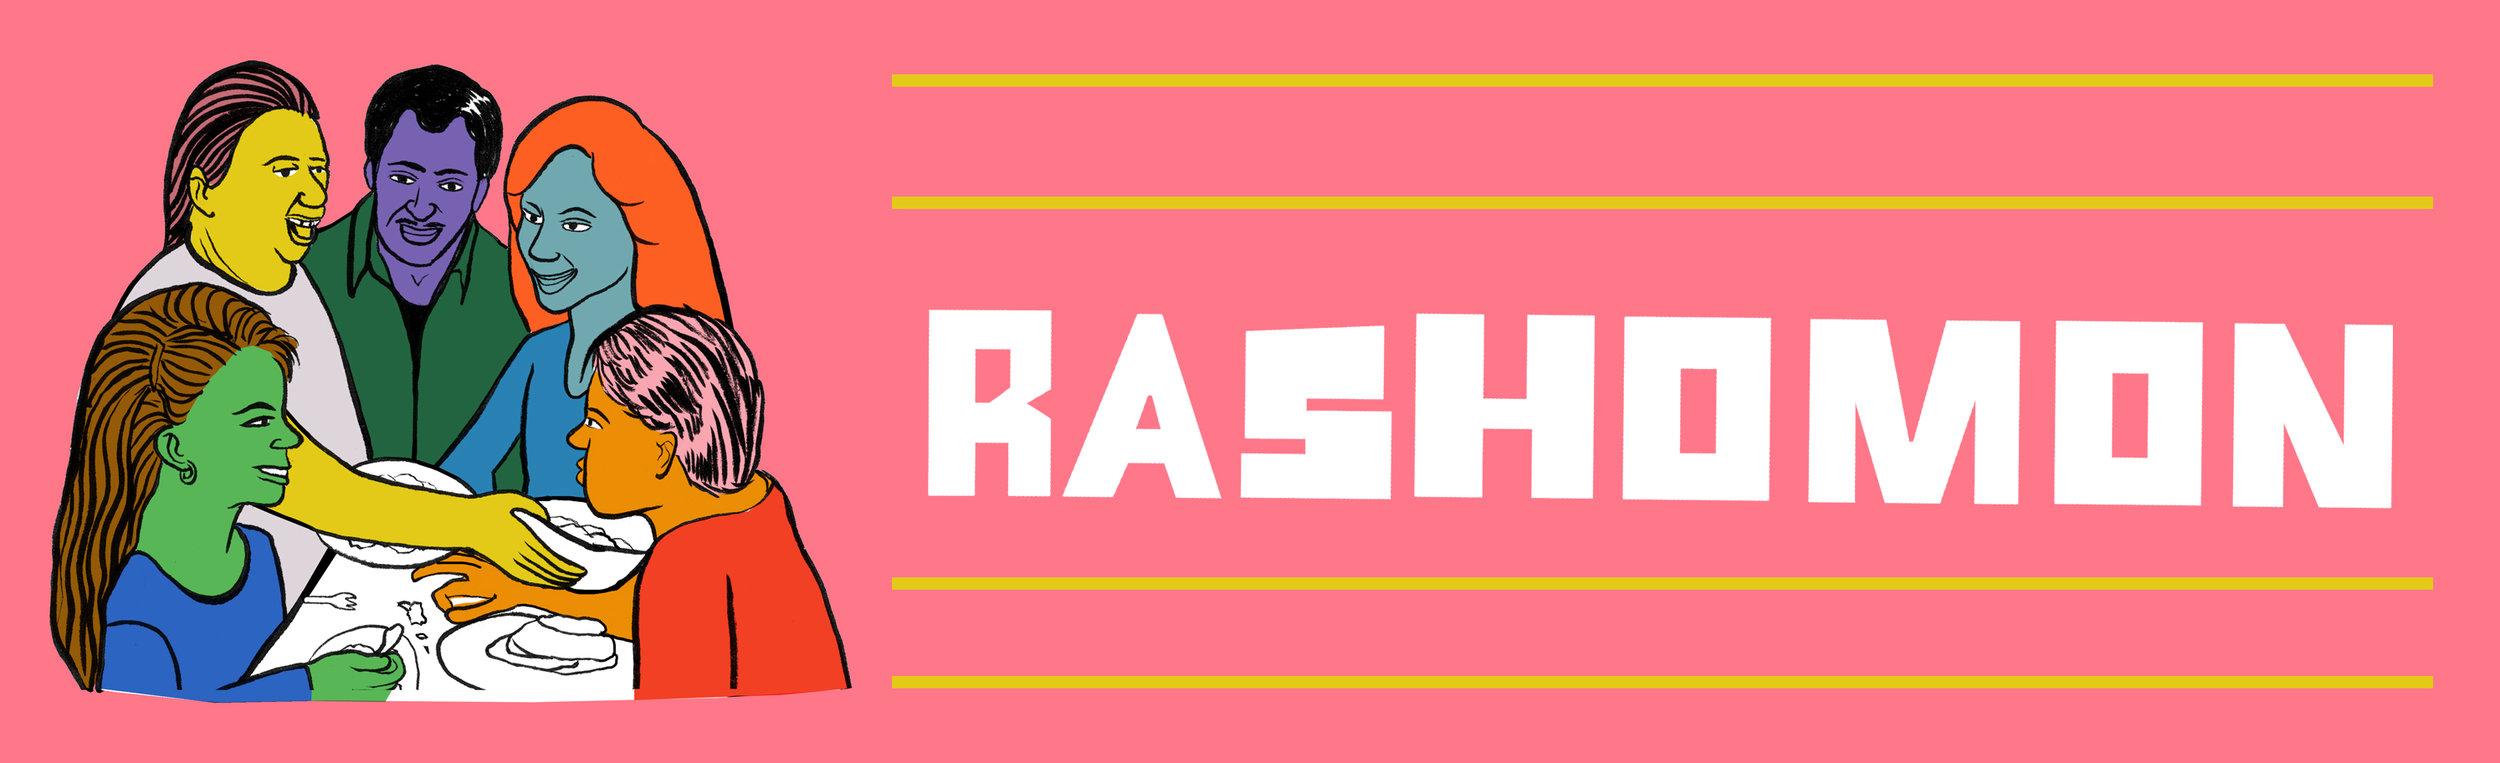 Rashomon Header.jpg